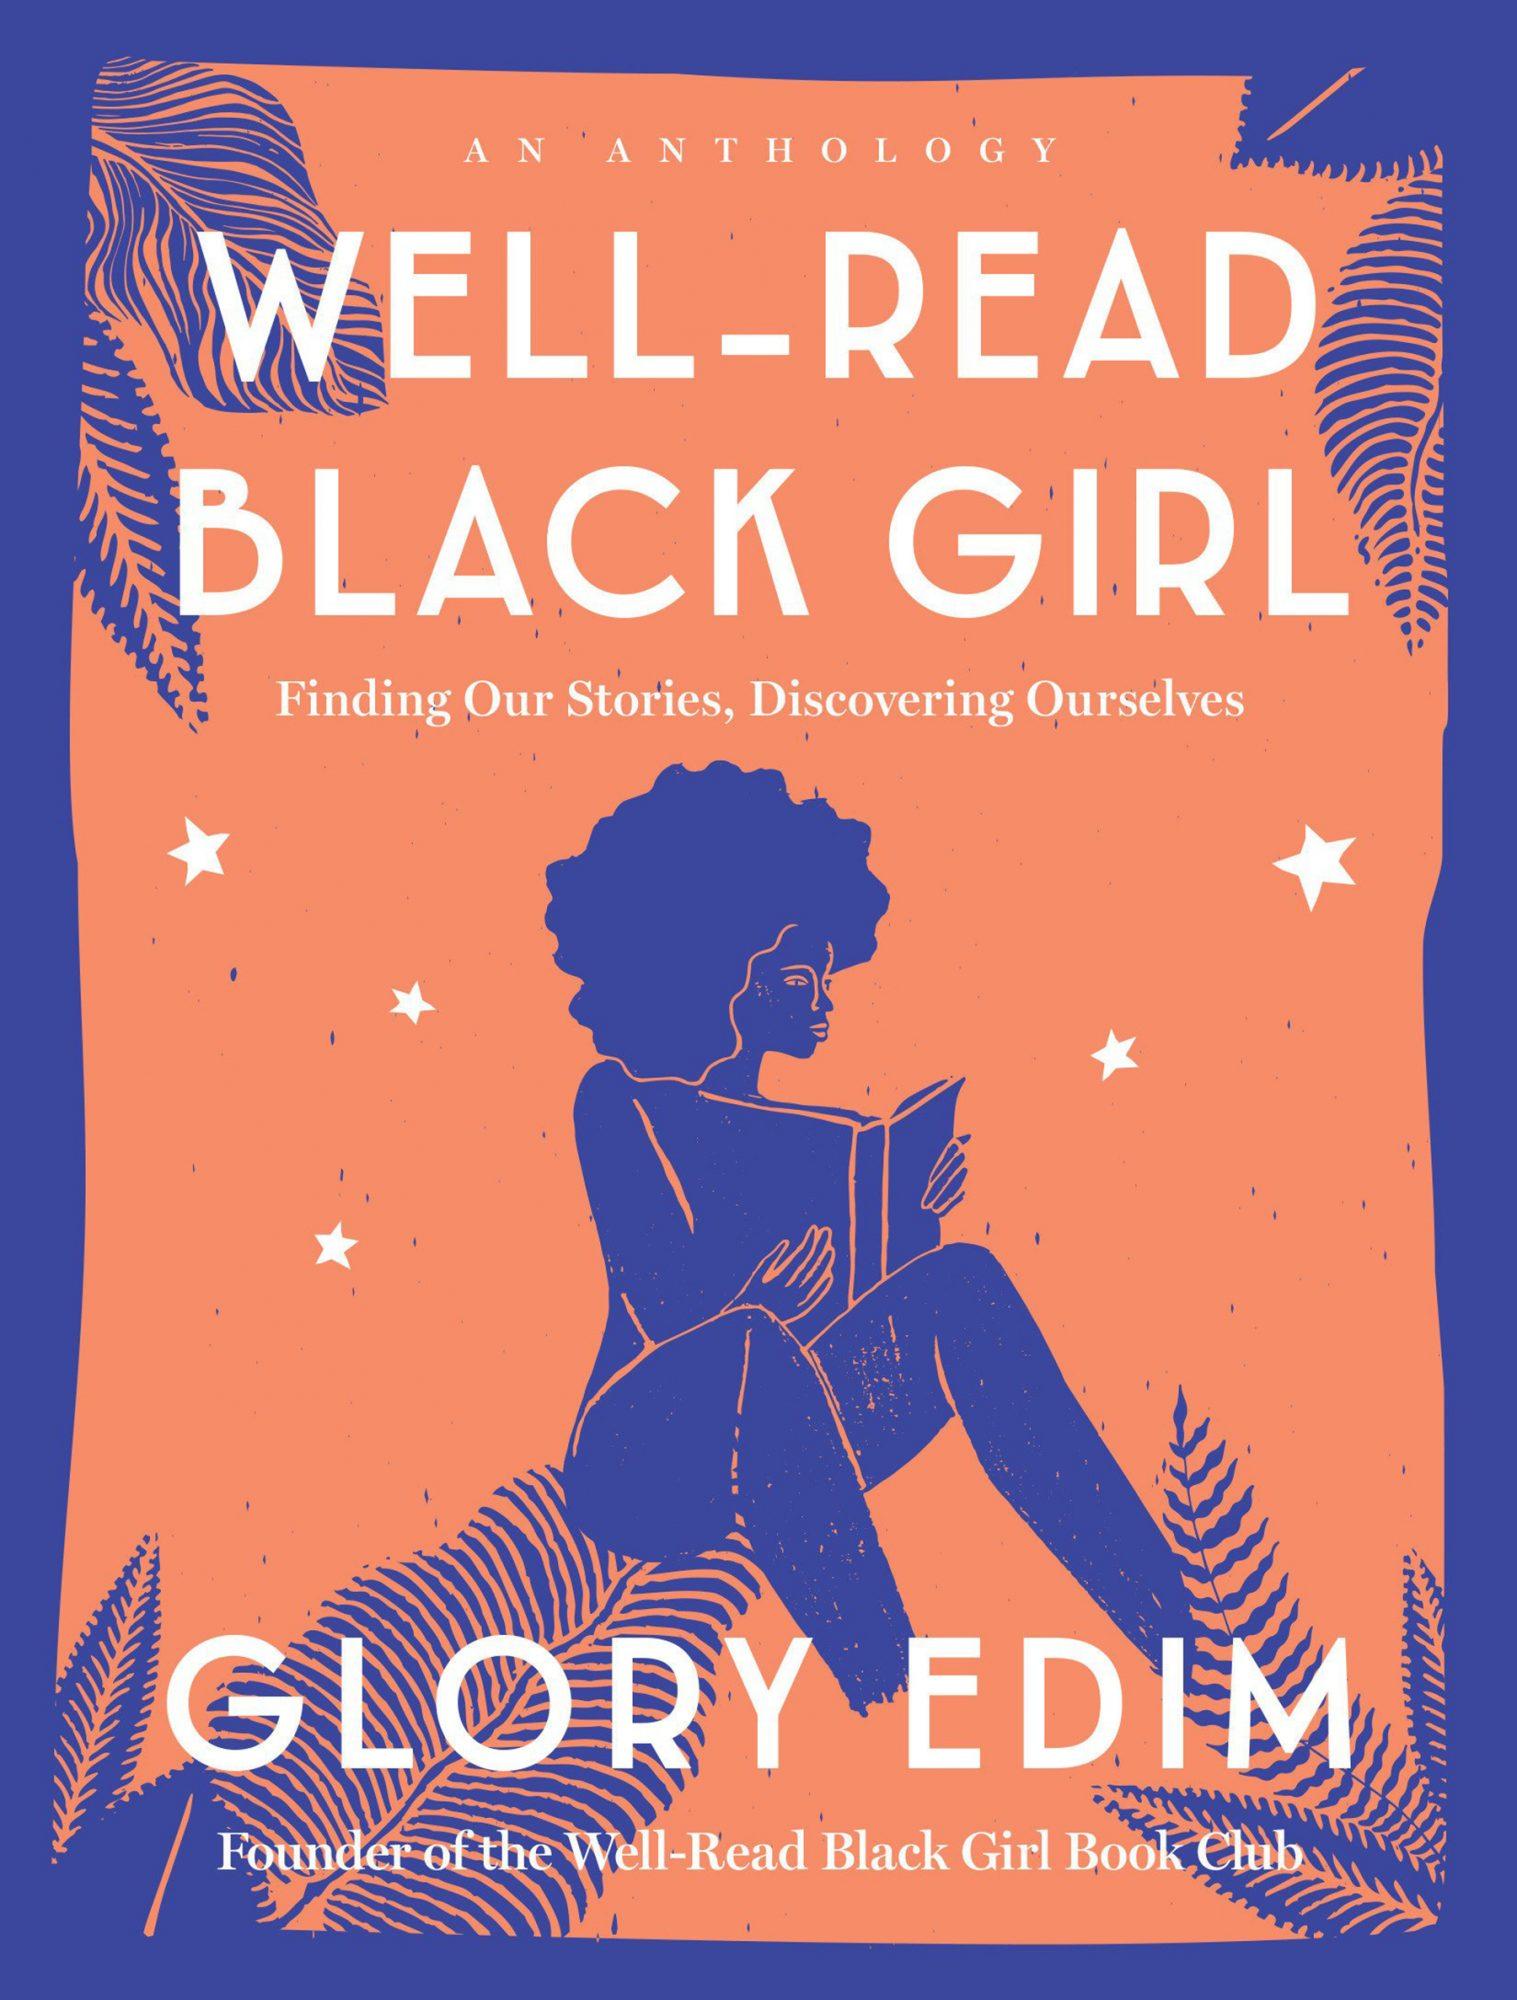 Well-Read Black Girl by Glory Edim Credit: Ballantine Books